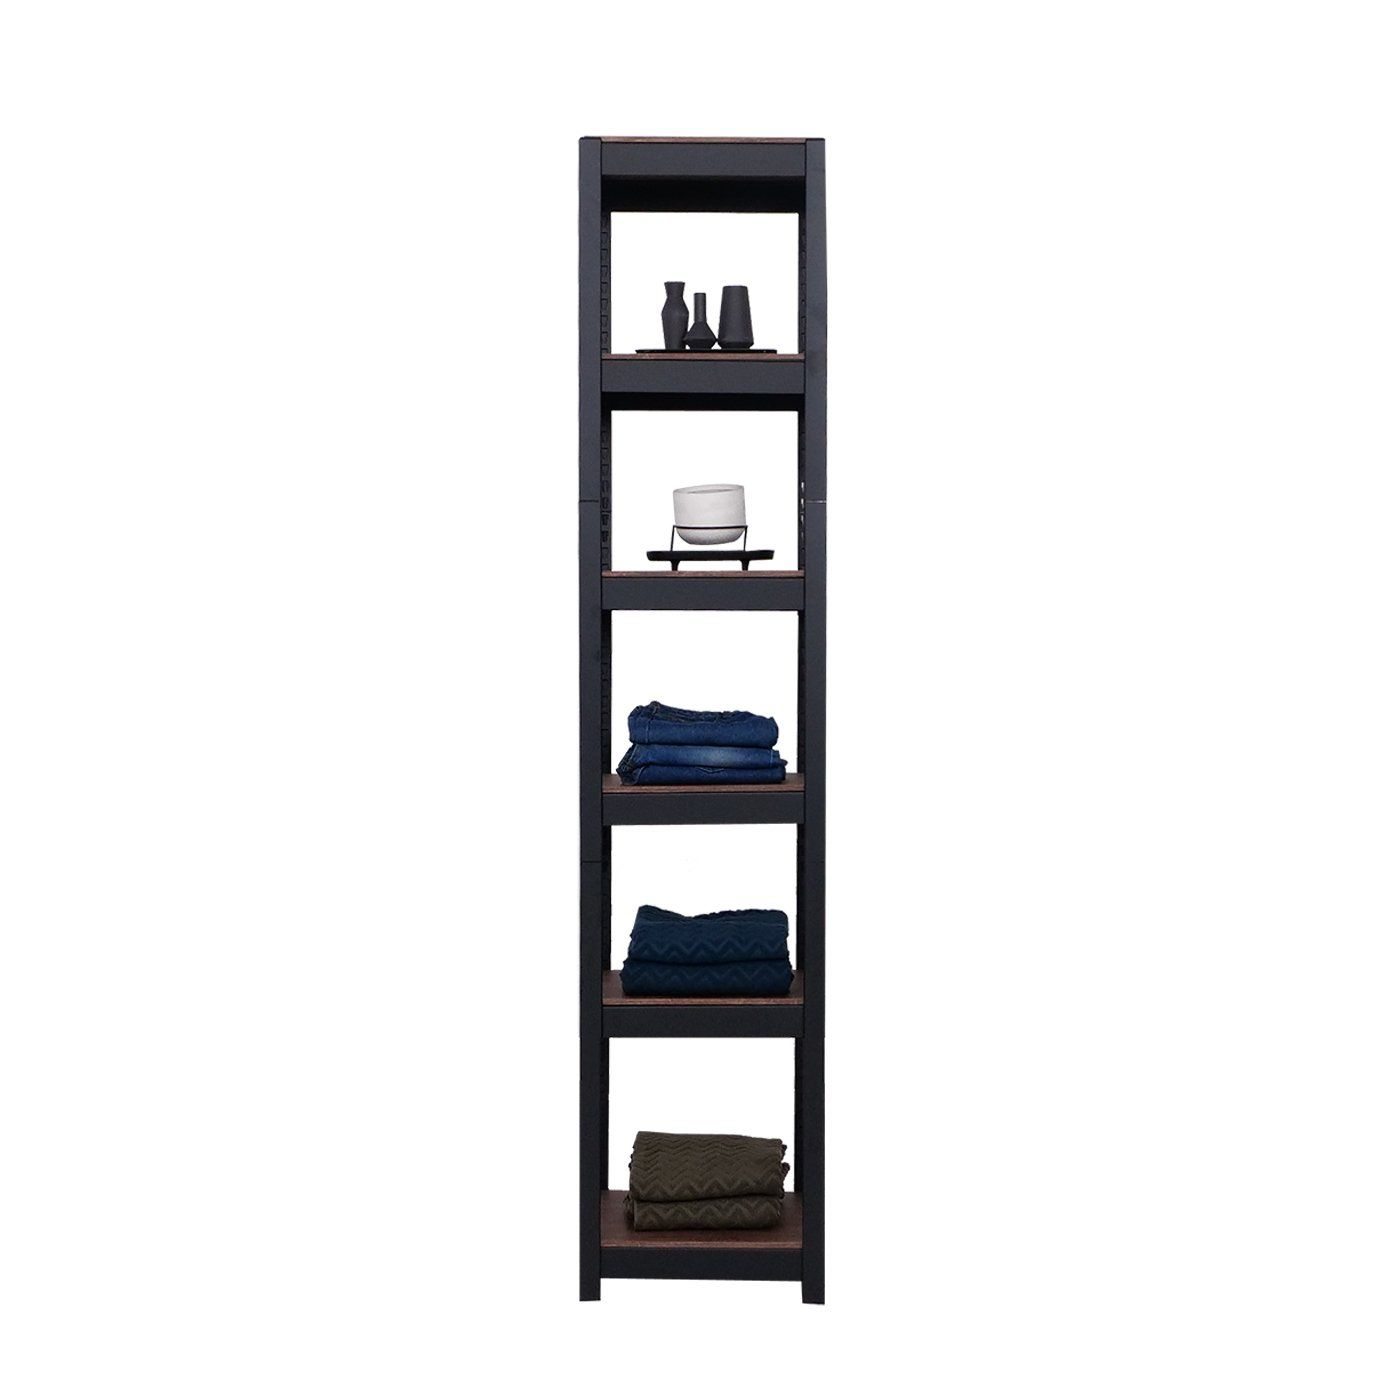 5 Shelf Module in Black